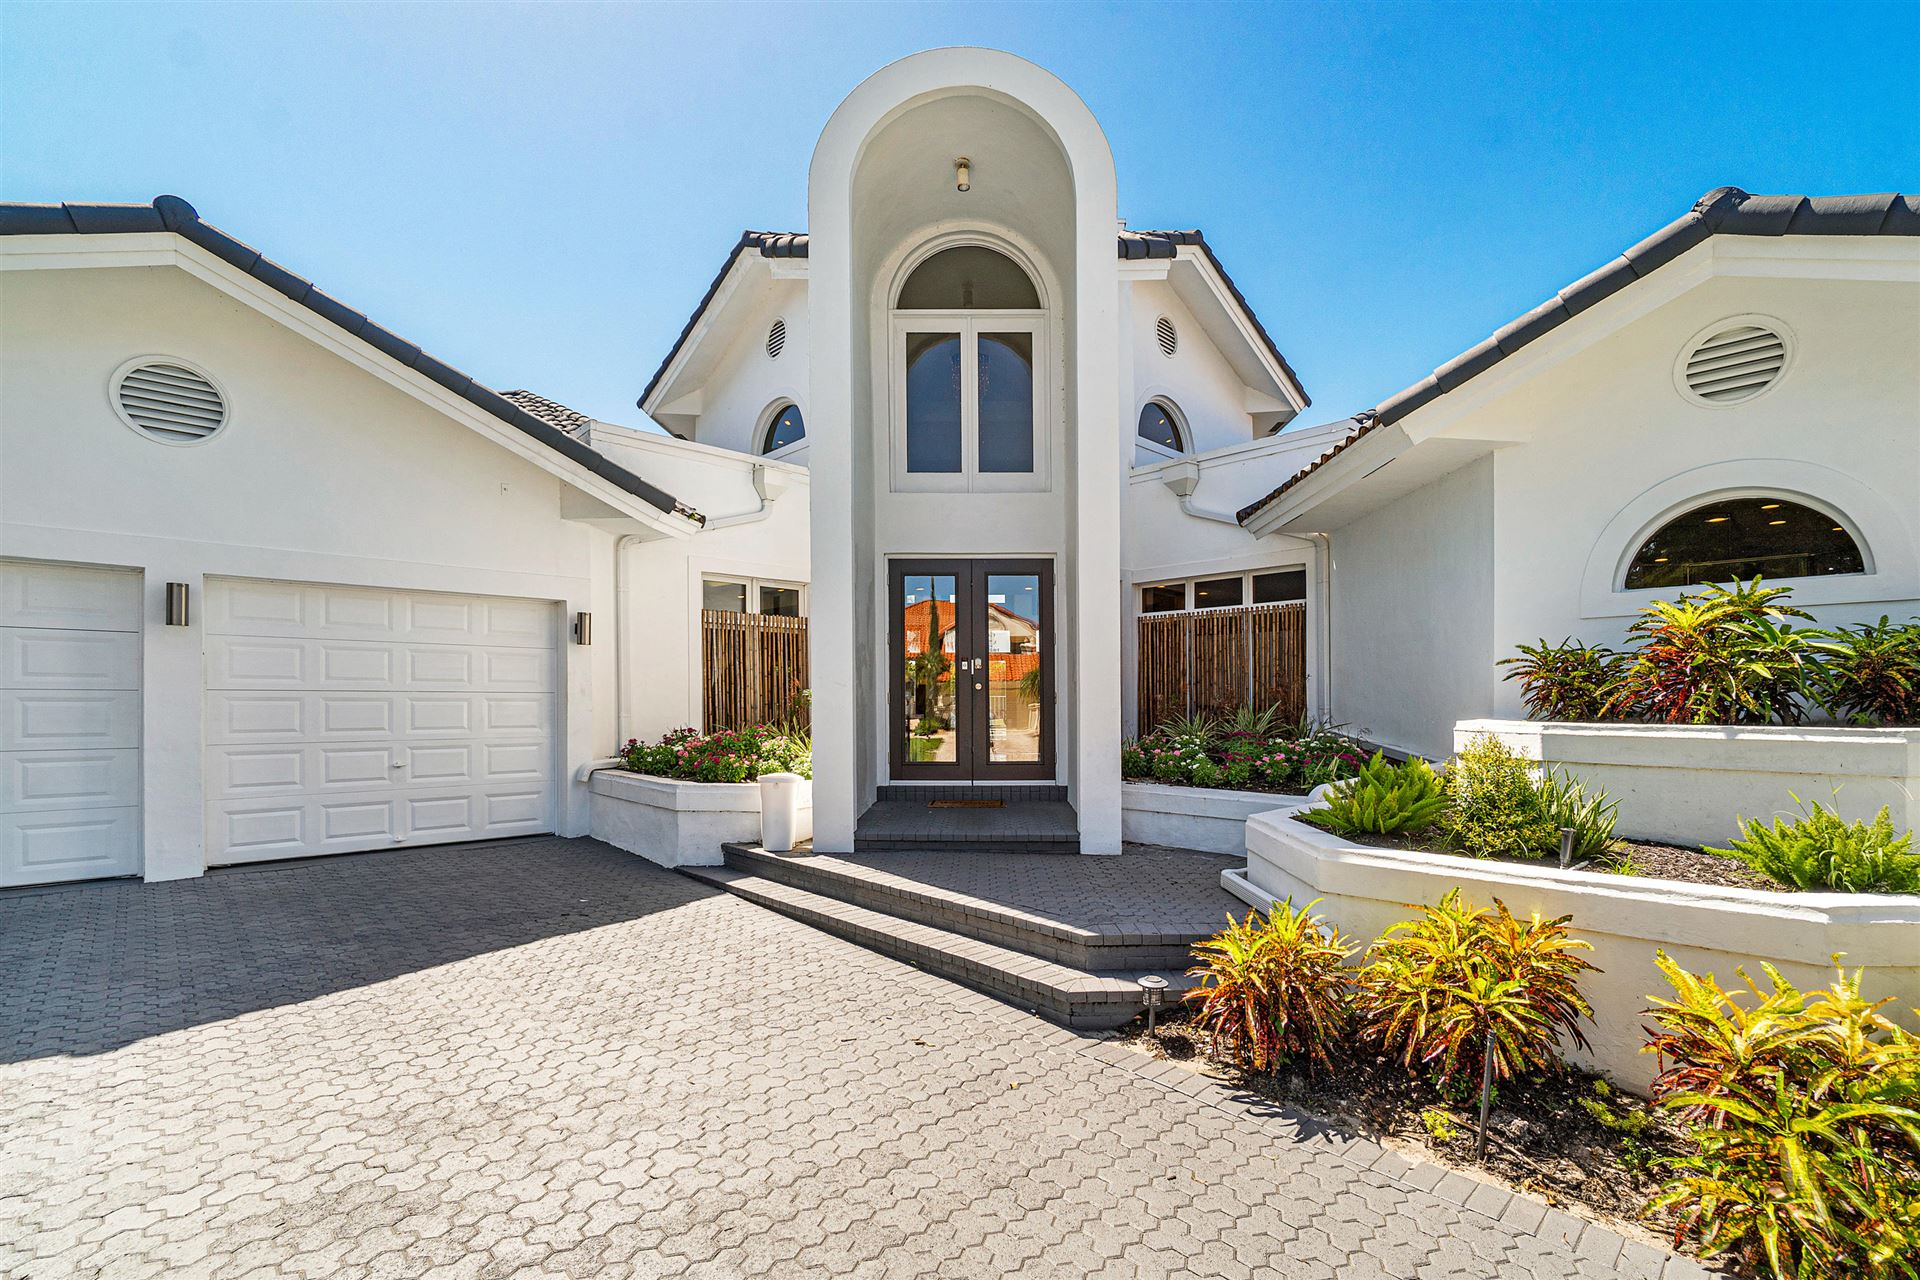 21459 Burnside Court, Boca Raton, FL 33433 - MLS#: RX-10686546